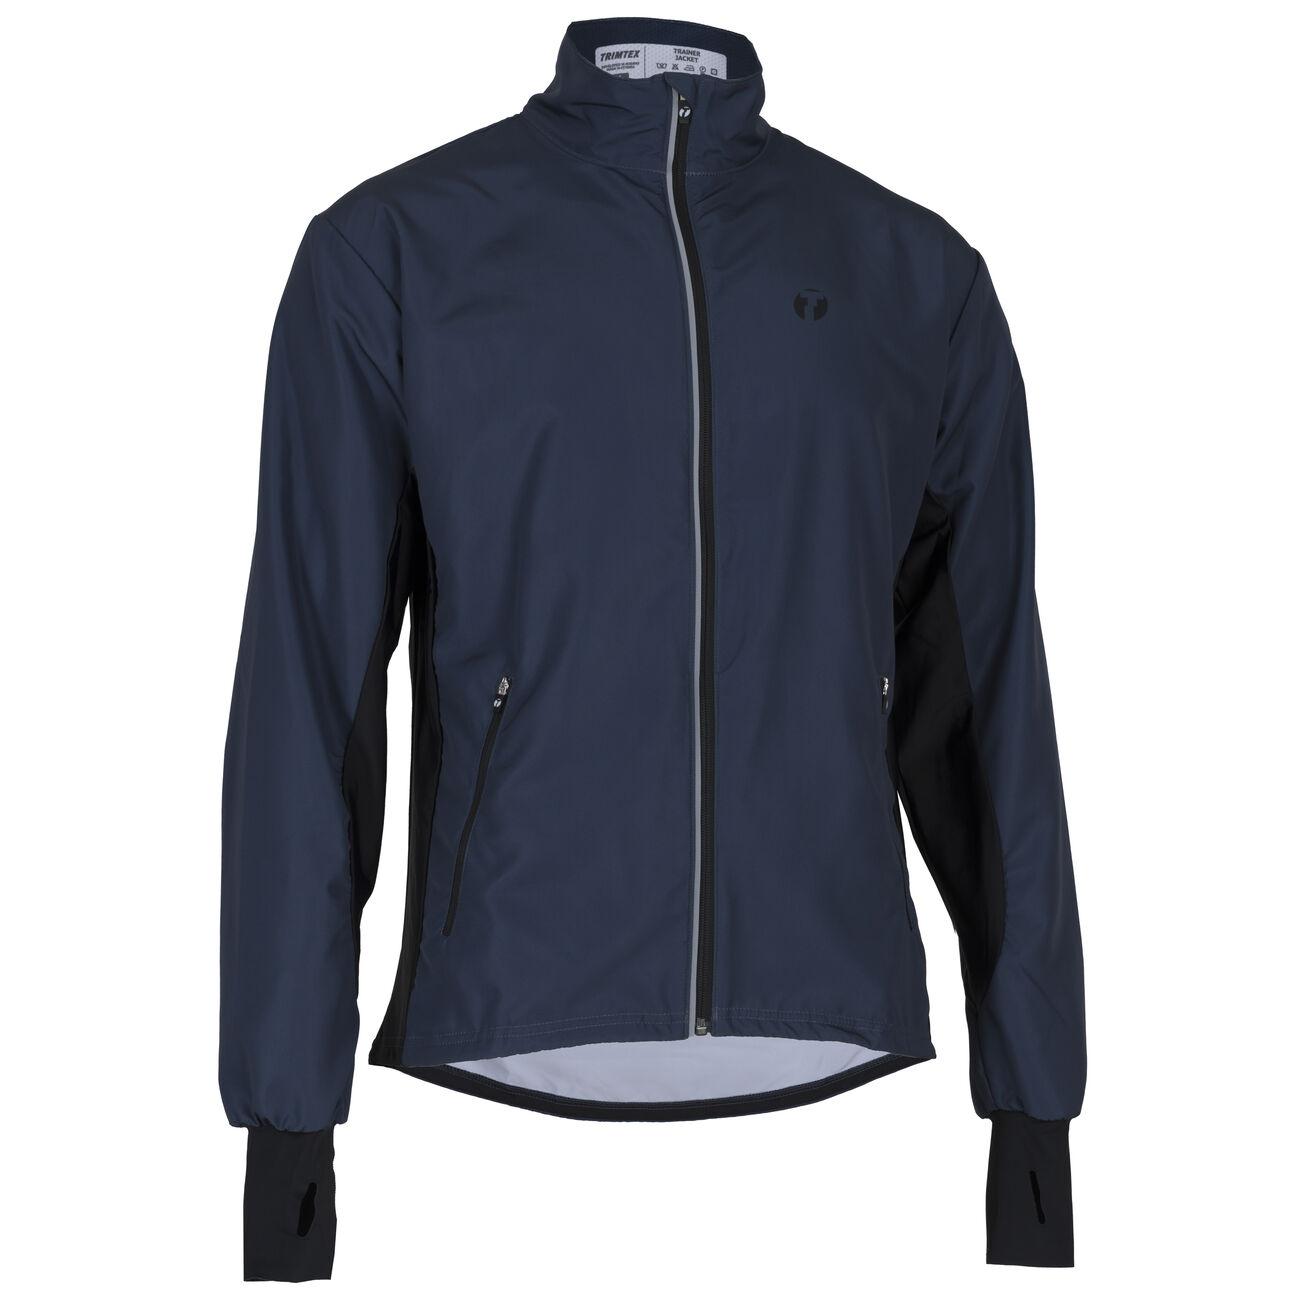 Trainer training jacket men's